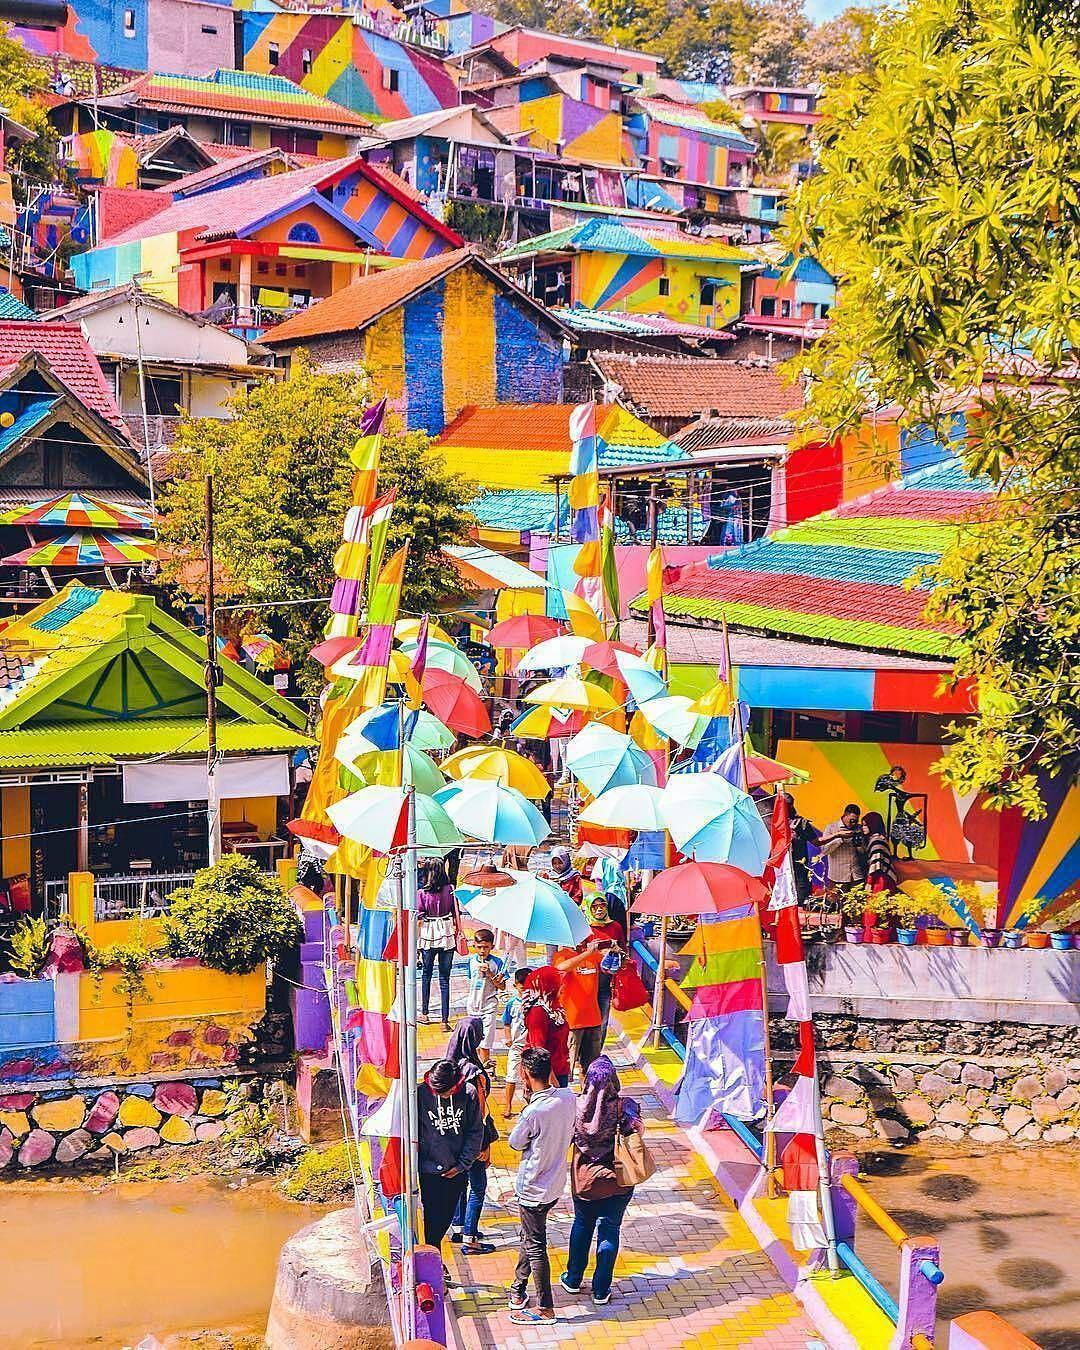 Kampung pelangi Jodipan, Malang | Sumber: Harga Tiket Wisata